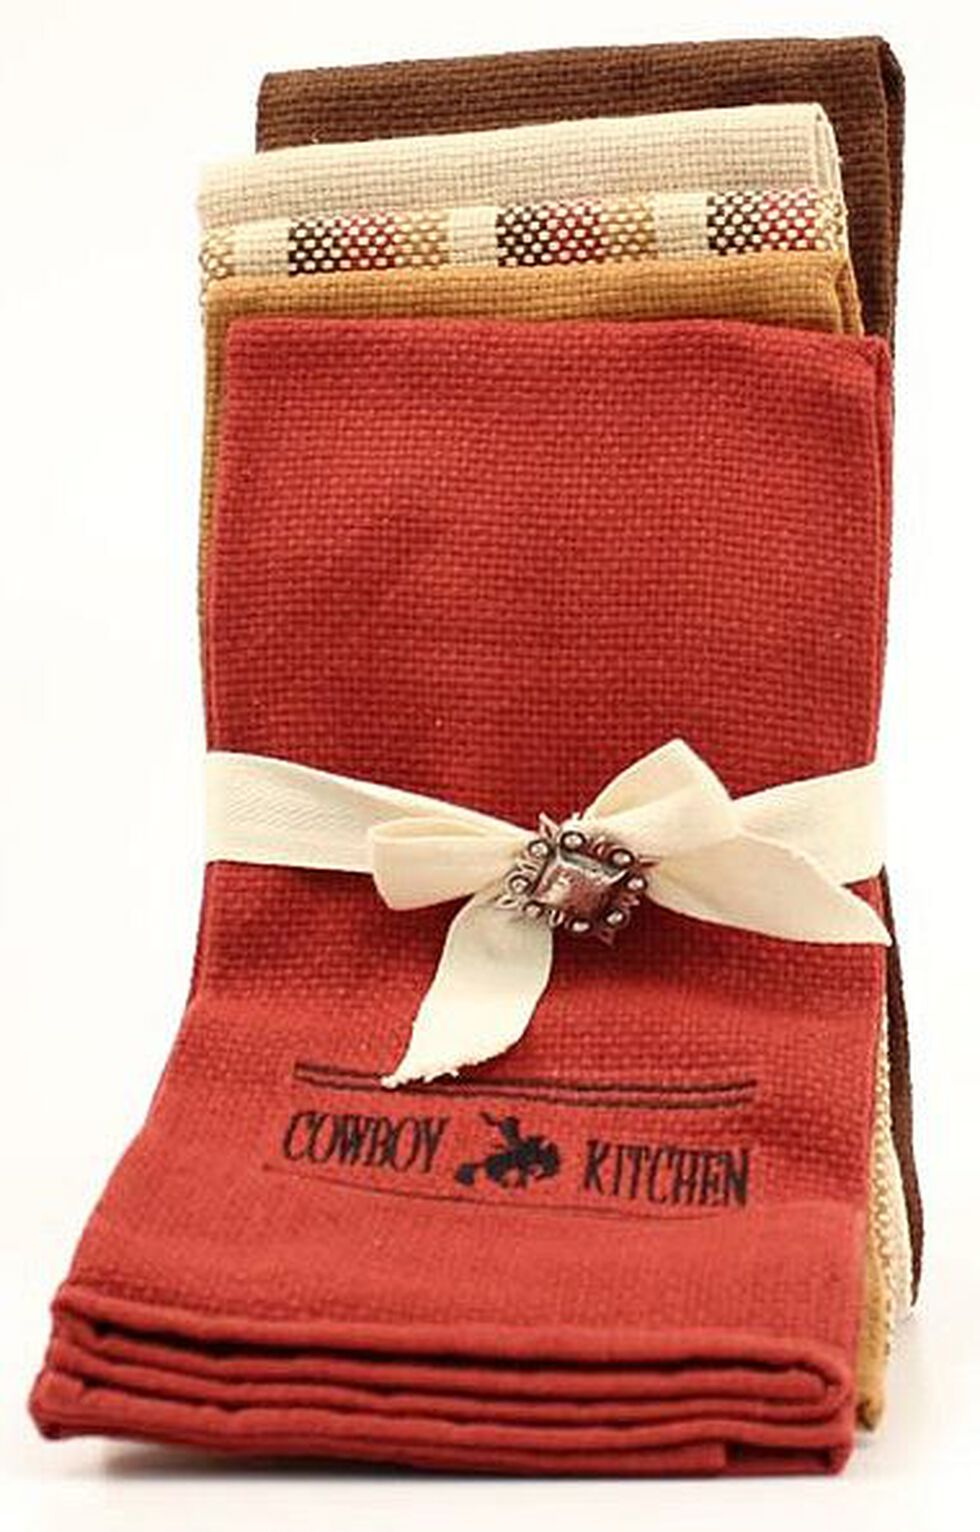 Cowboy Prayer Kitchen Towel Set, Multi, hi-res